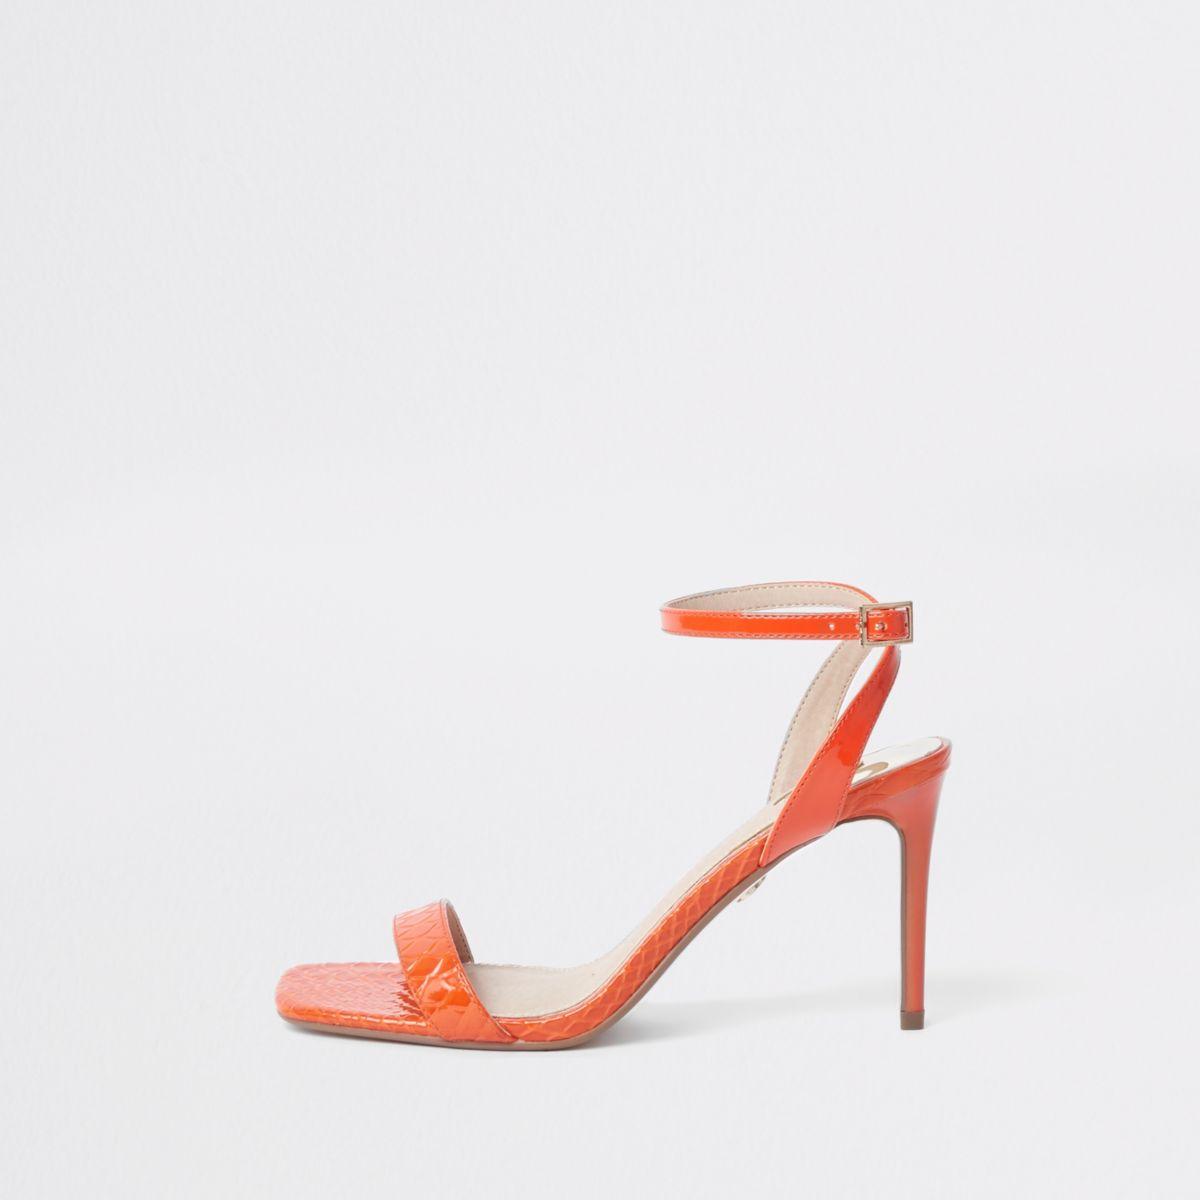 Orange barely there mid heel sandals